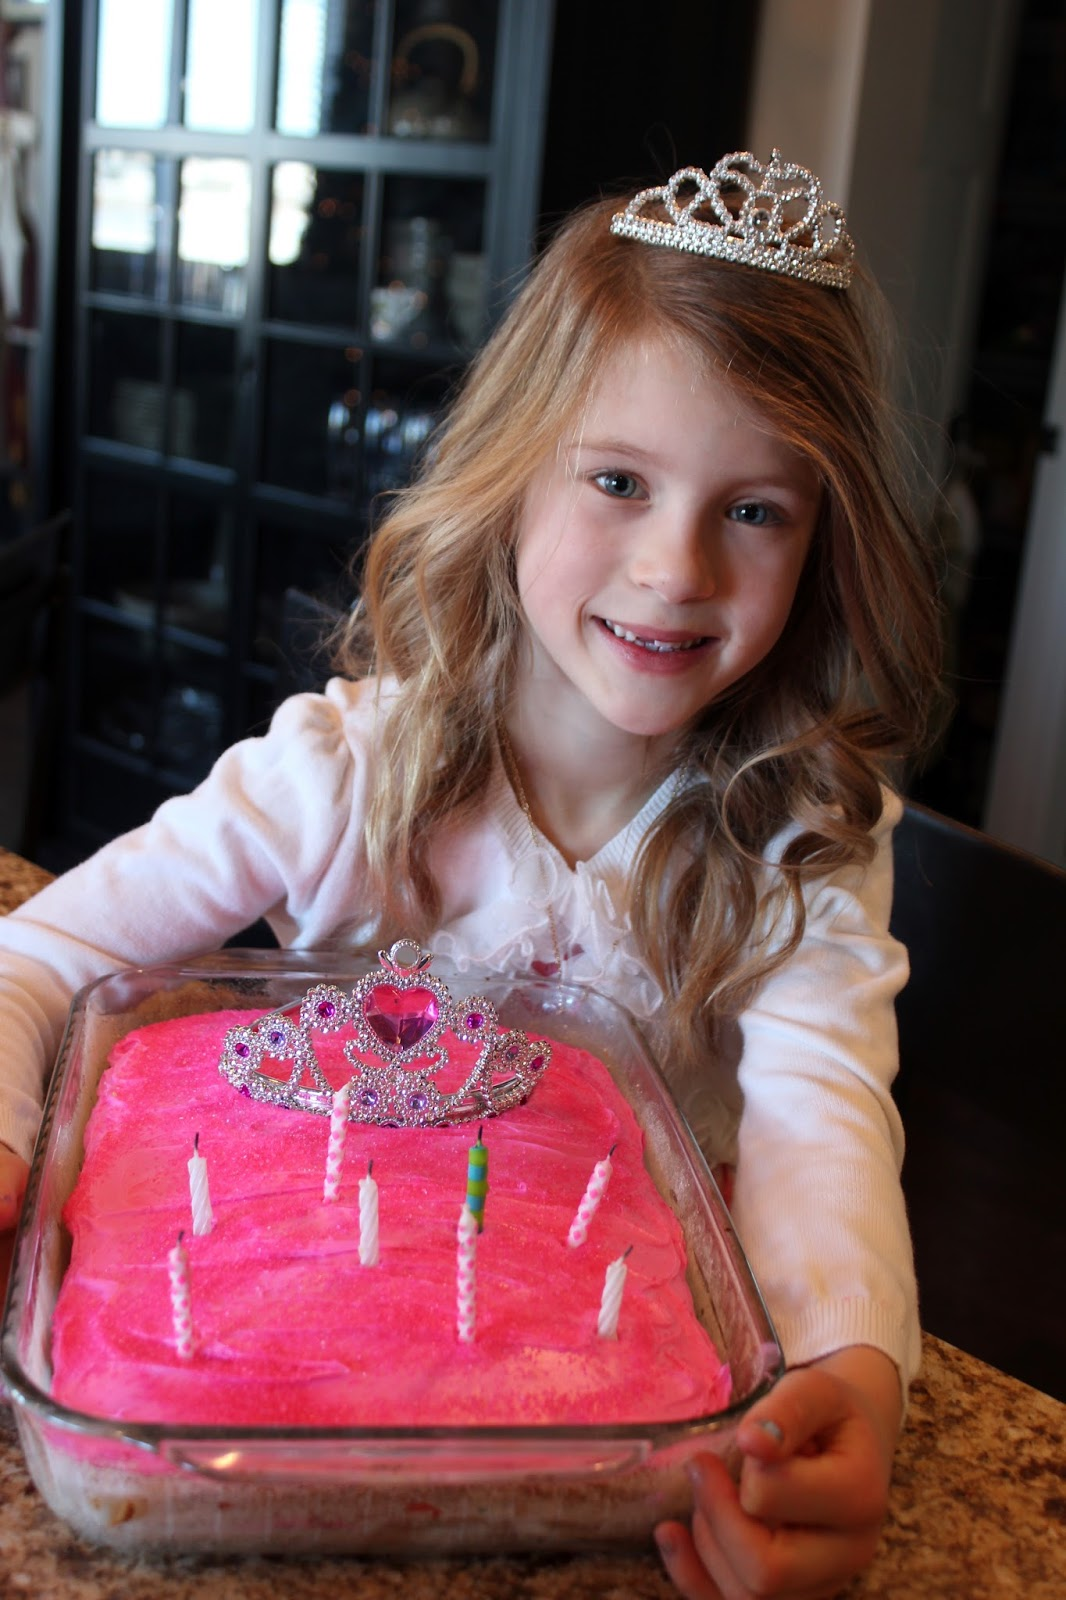 8 Year Boy Bedroom Design: The Berger Blog: Sophia's Turns 8 Years Old